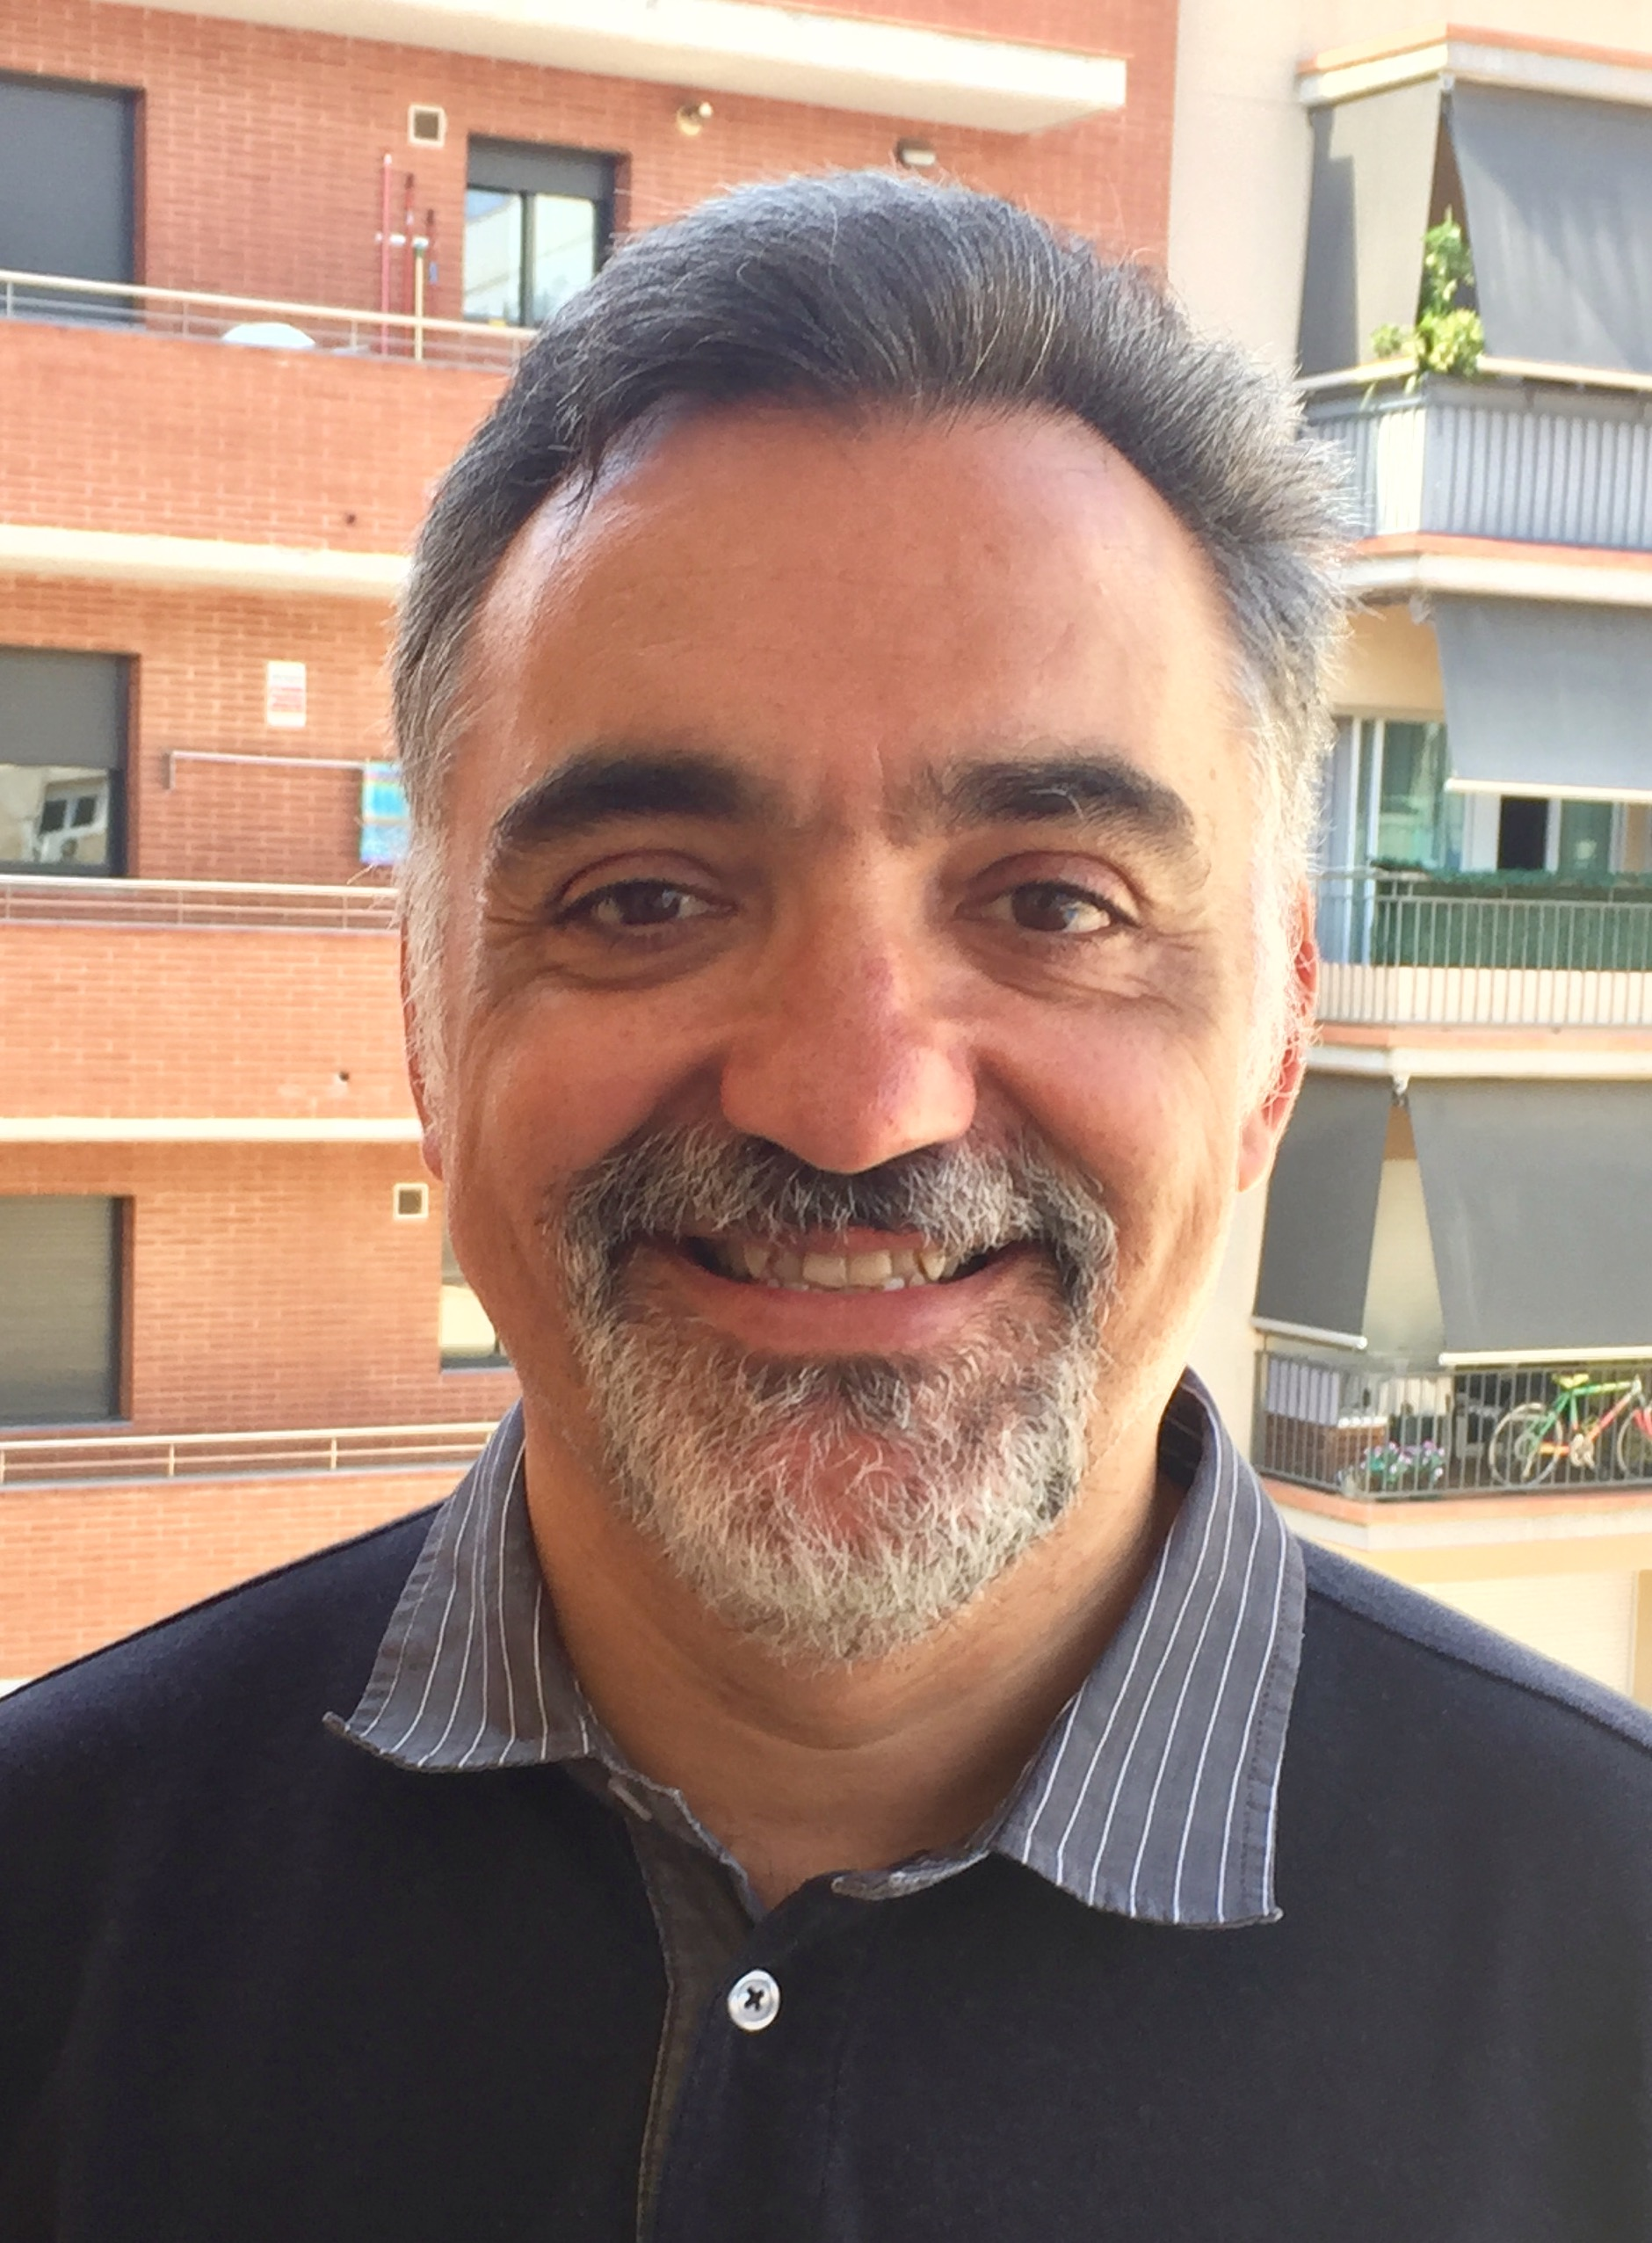 Josep Manuel Rodríguez Gairín